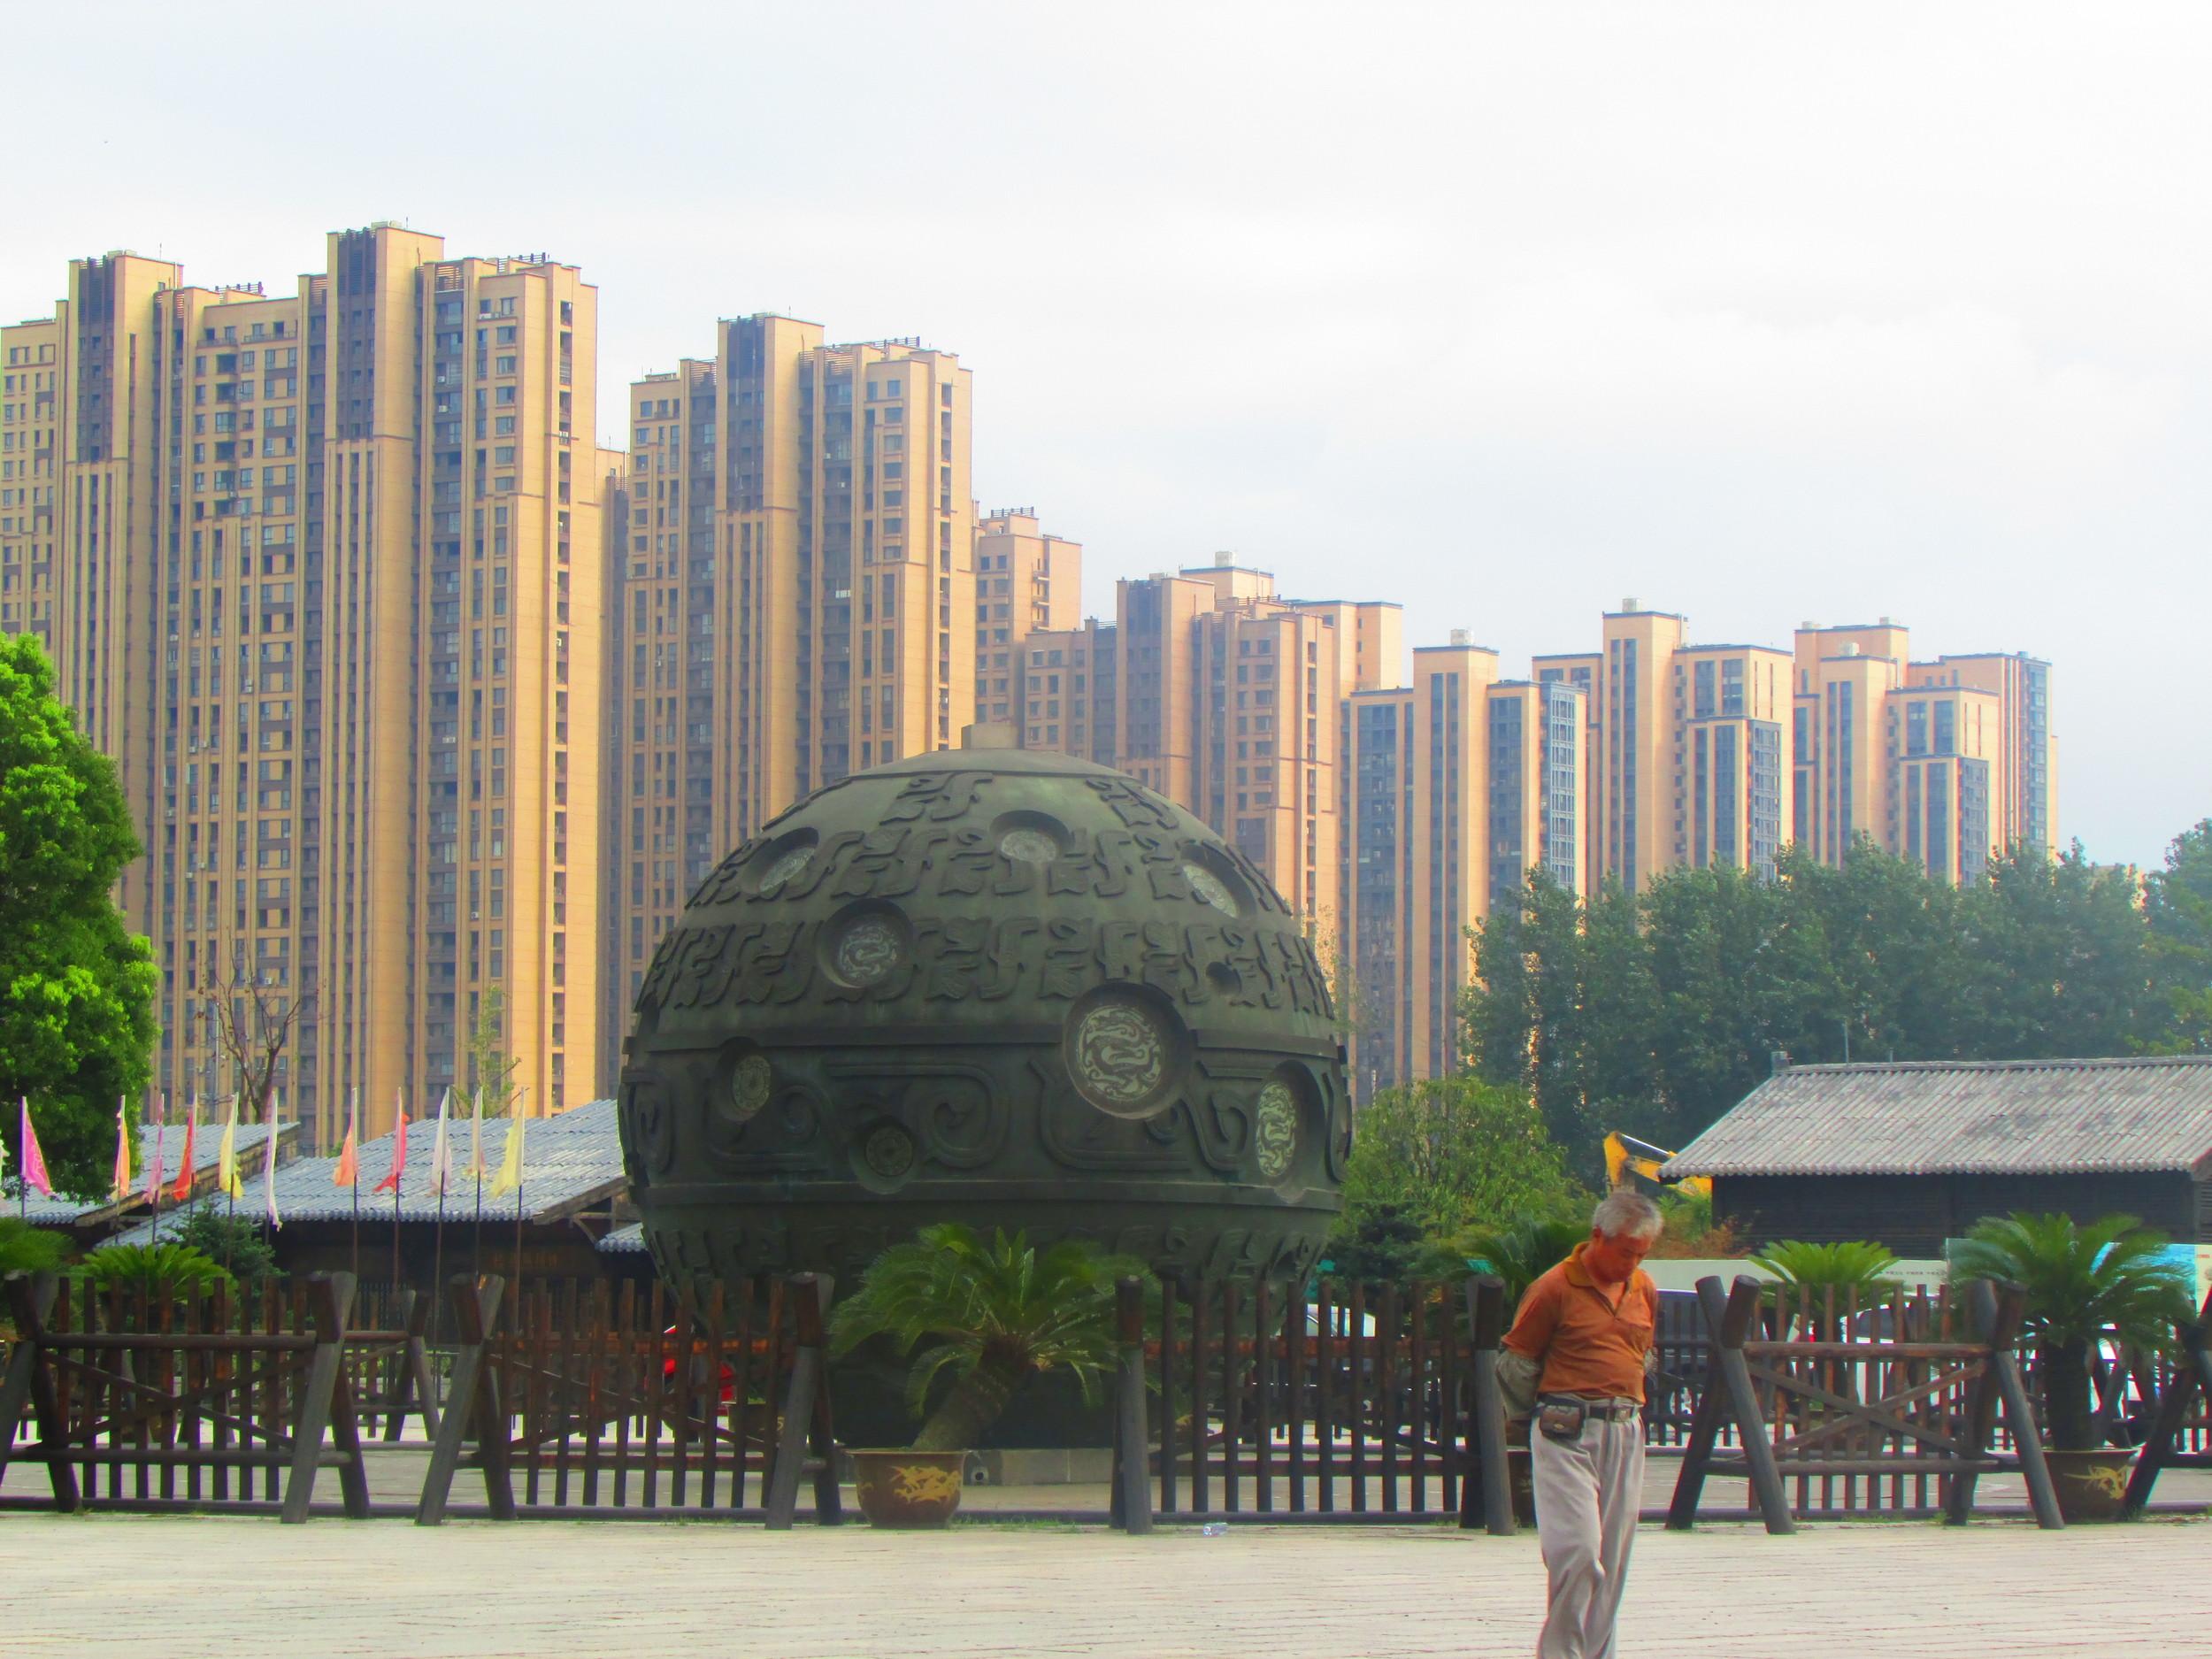 Outside of the history themed Yancheng Park in Changzhou, Jiangsu province.